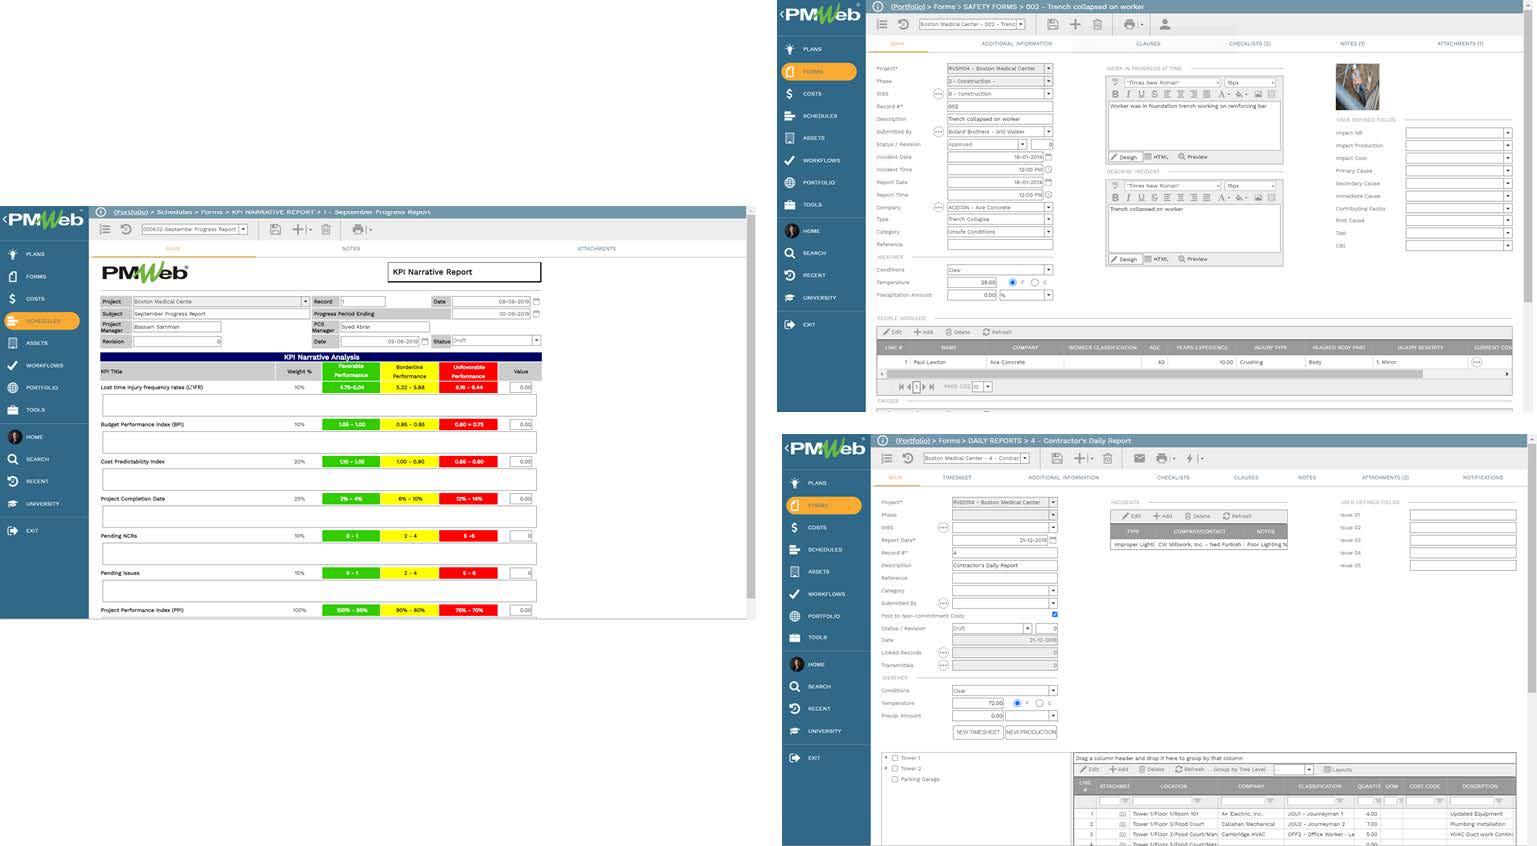 PMWeb 7 Schedules Forms Main  PMWeb 7 Forms Safety Forms Main  PMWeb 7 Forms Daily Reports Contractor Daily Report Main